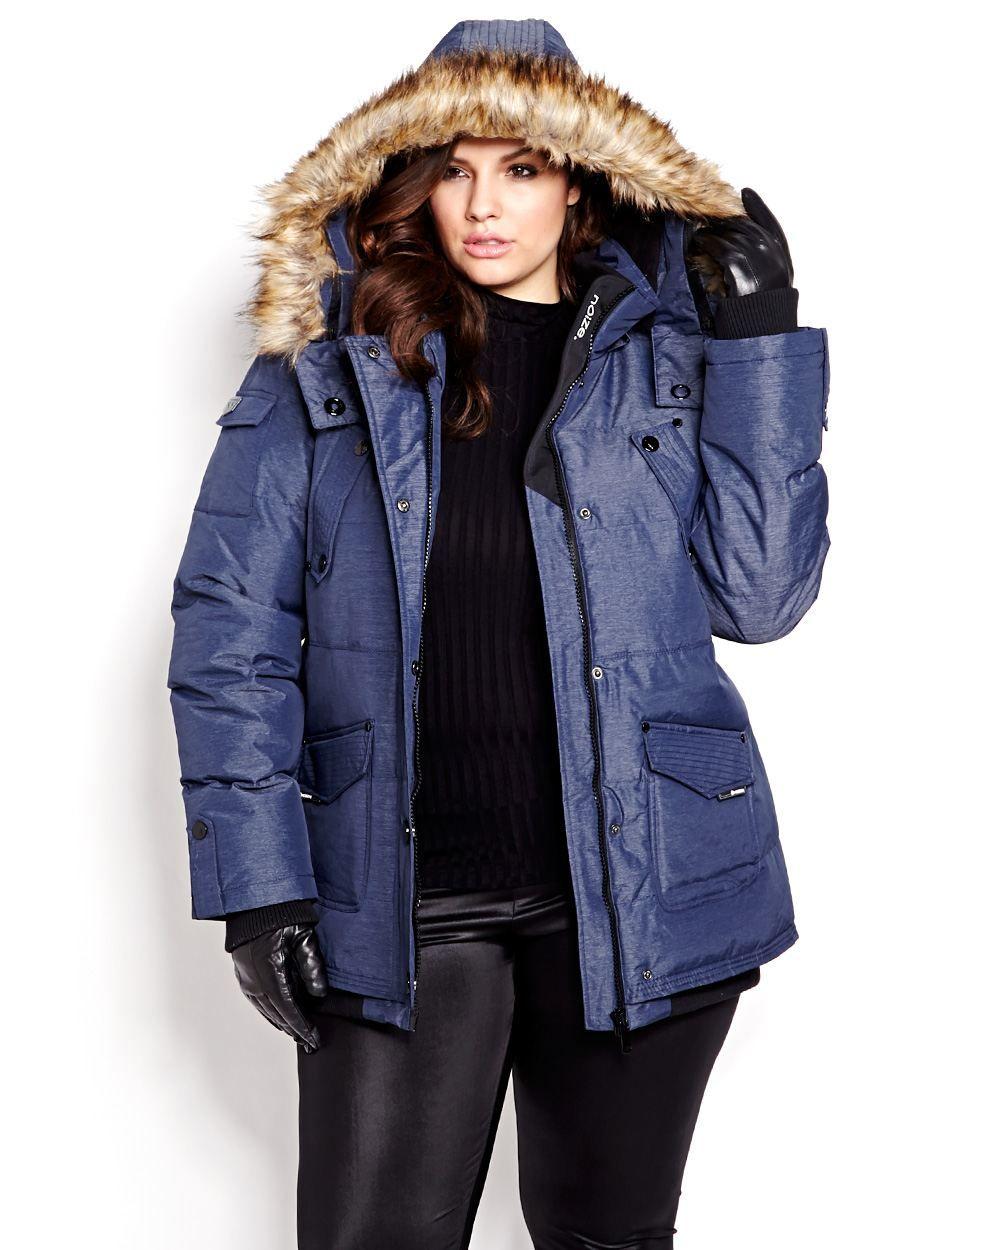 37da6714f77 Noize Quilted Jacket. Noize Quilted Jacket Plus Size Winter